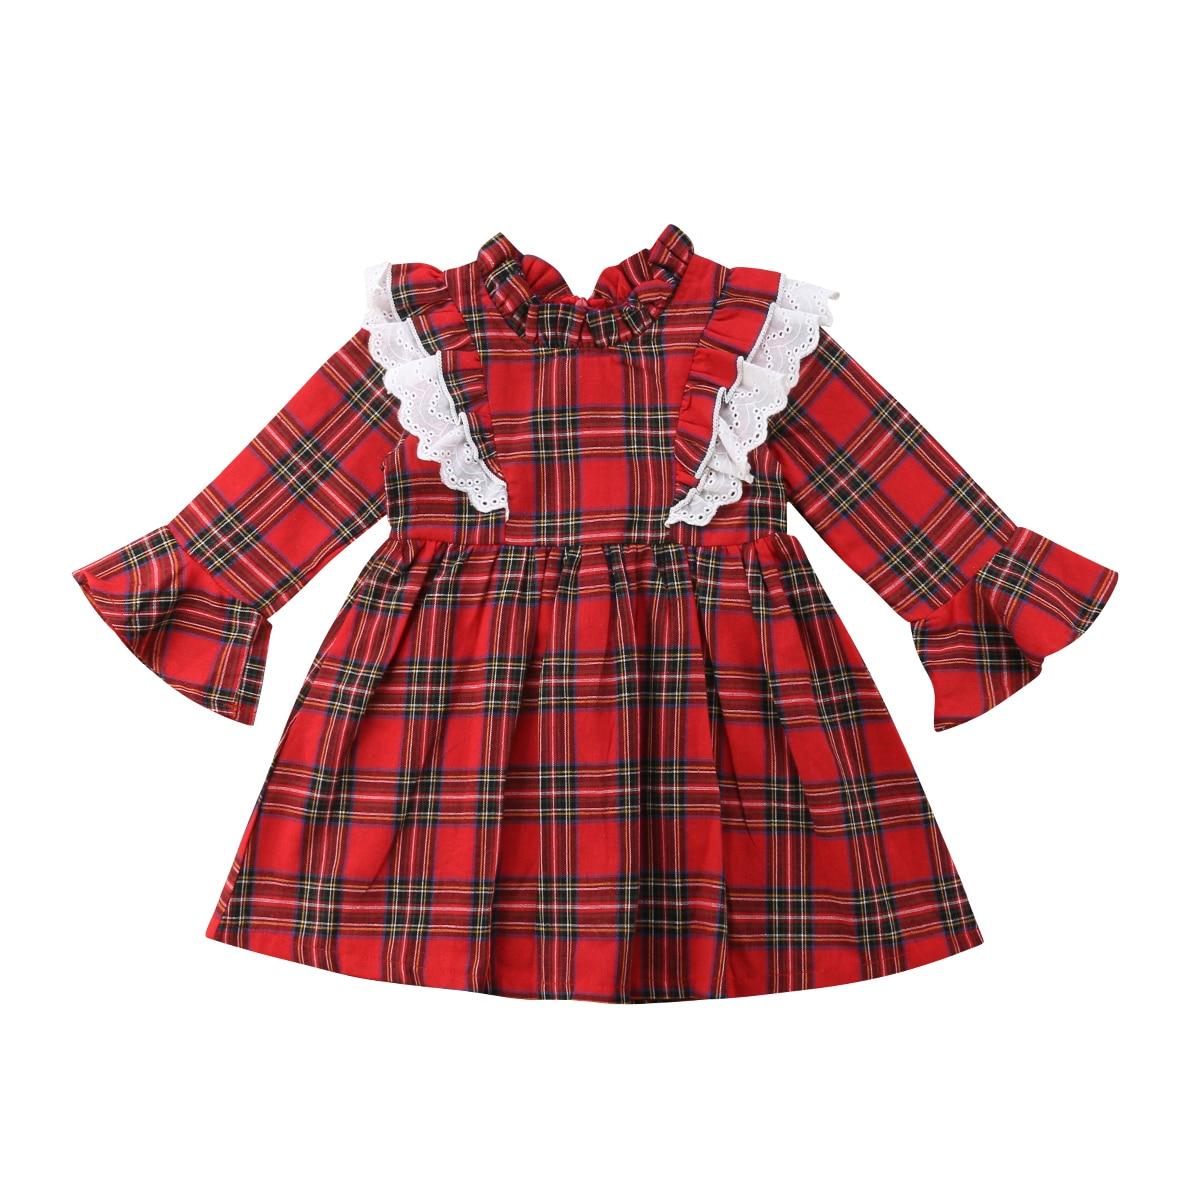 Christmas Newborn Baby Kids Girls Clothing Red Plaid Little Sister Romper Big Sister Dress Xmas Costumes Autumn New